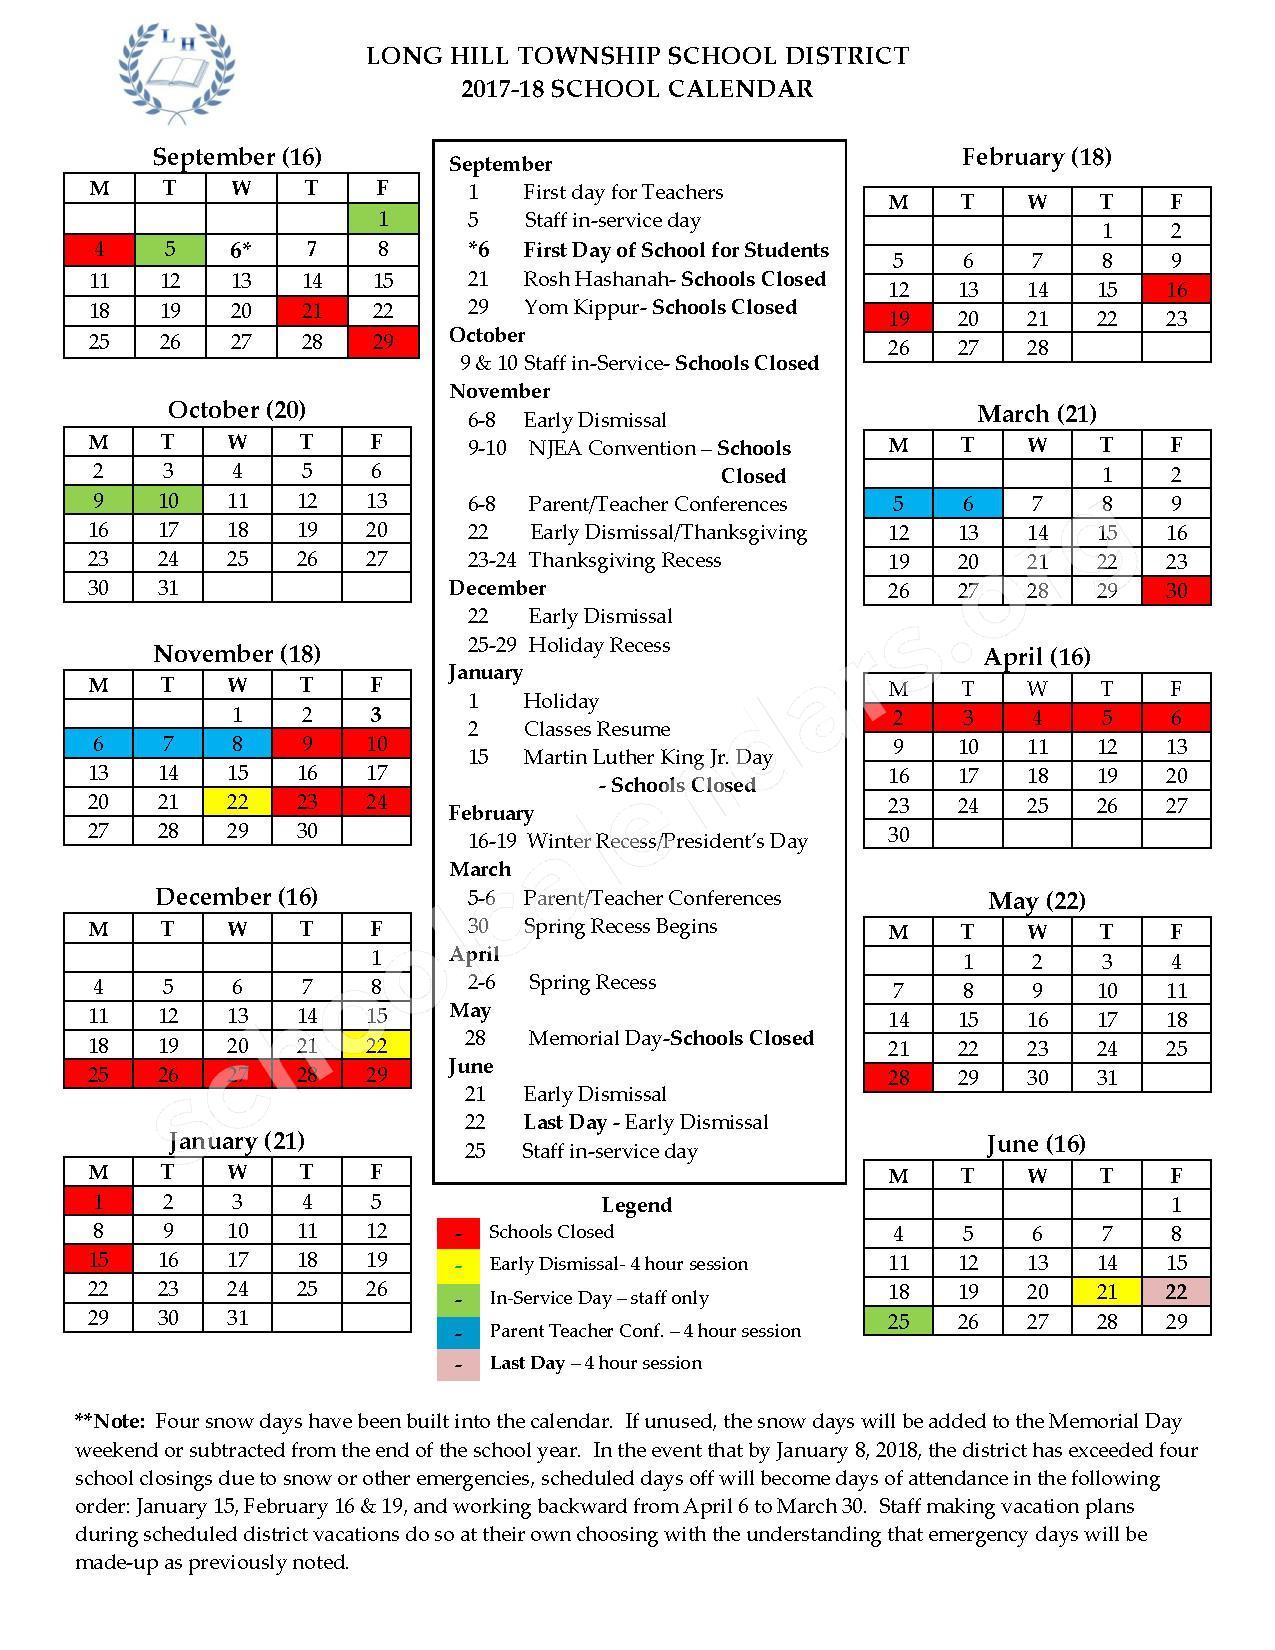 2017 - 2018 School Calendar – Long Hill Township School System – page 1